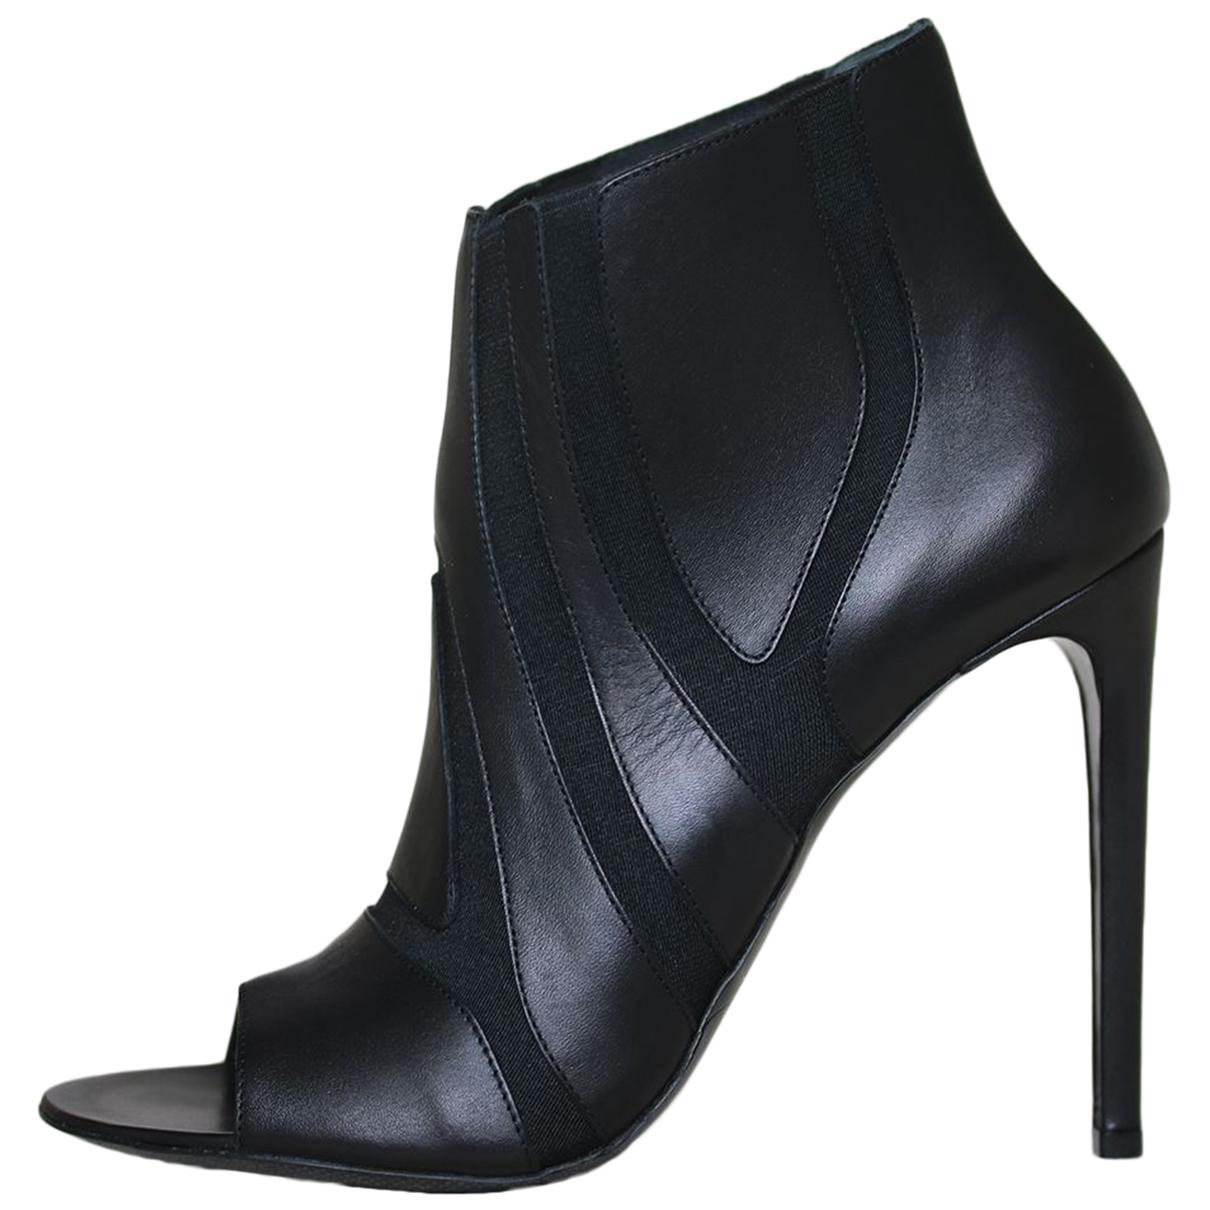 Balenciaga N Black Leather Ankle boots for Women 39 EU